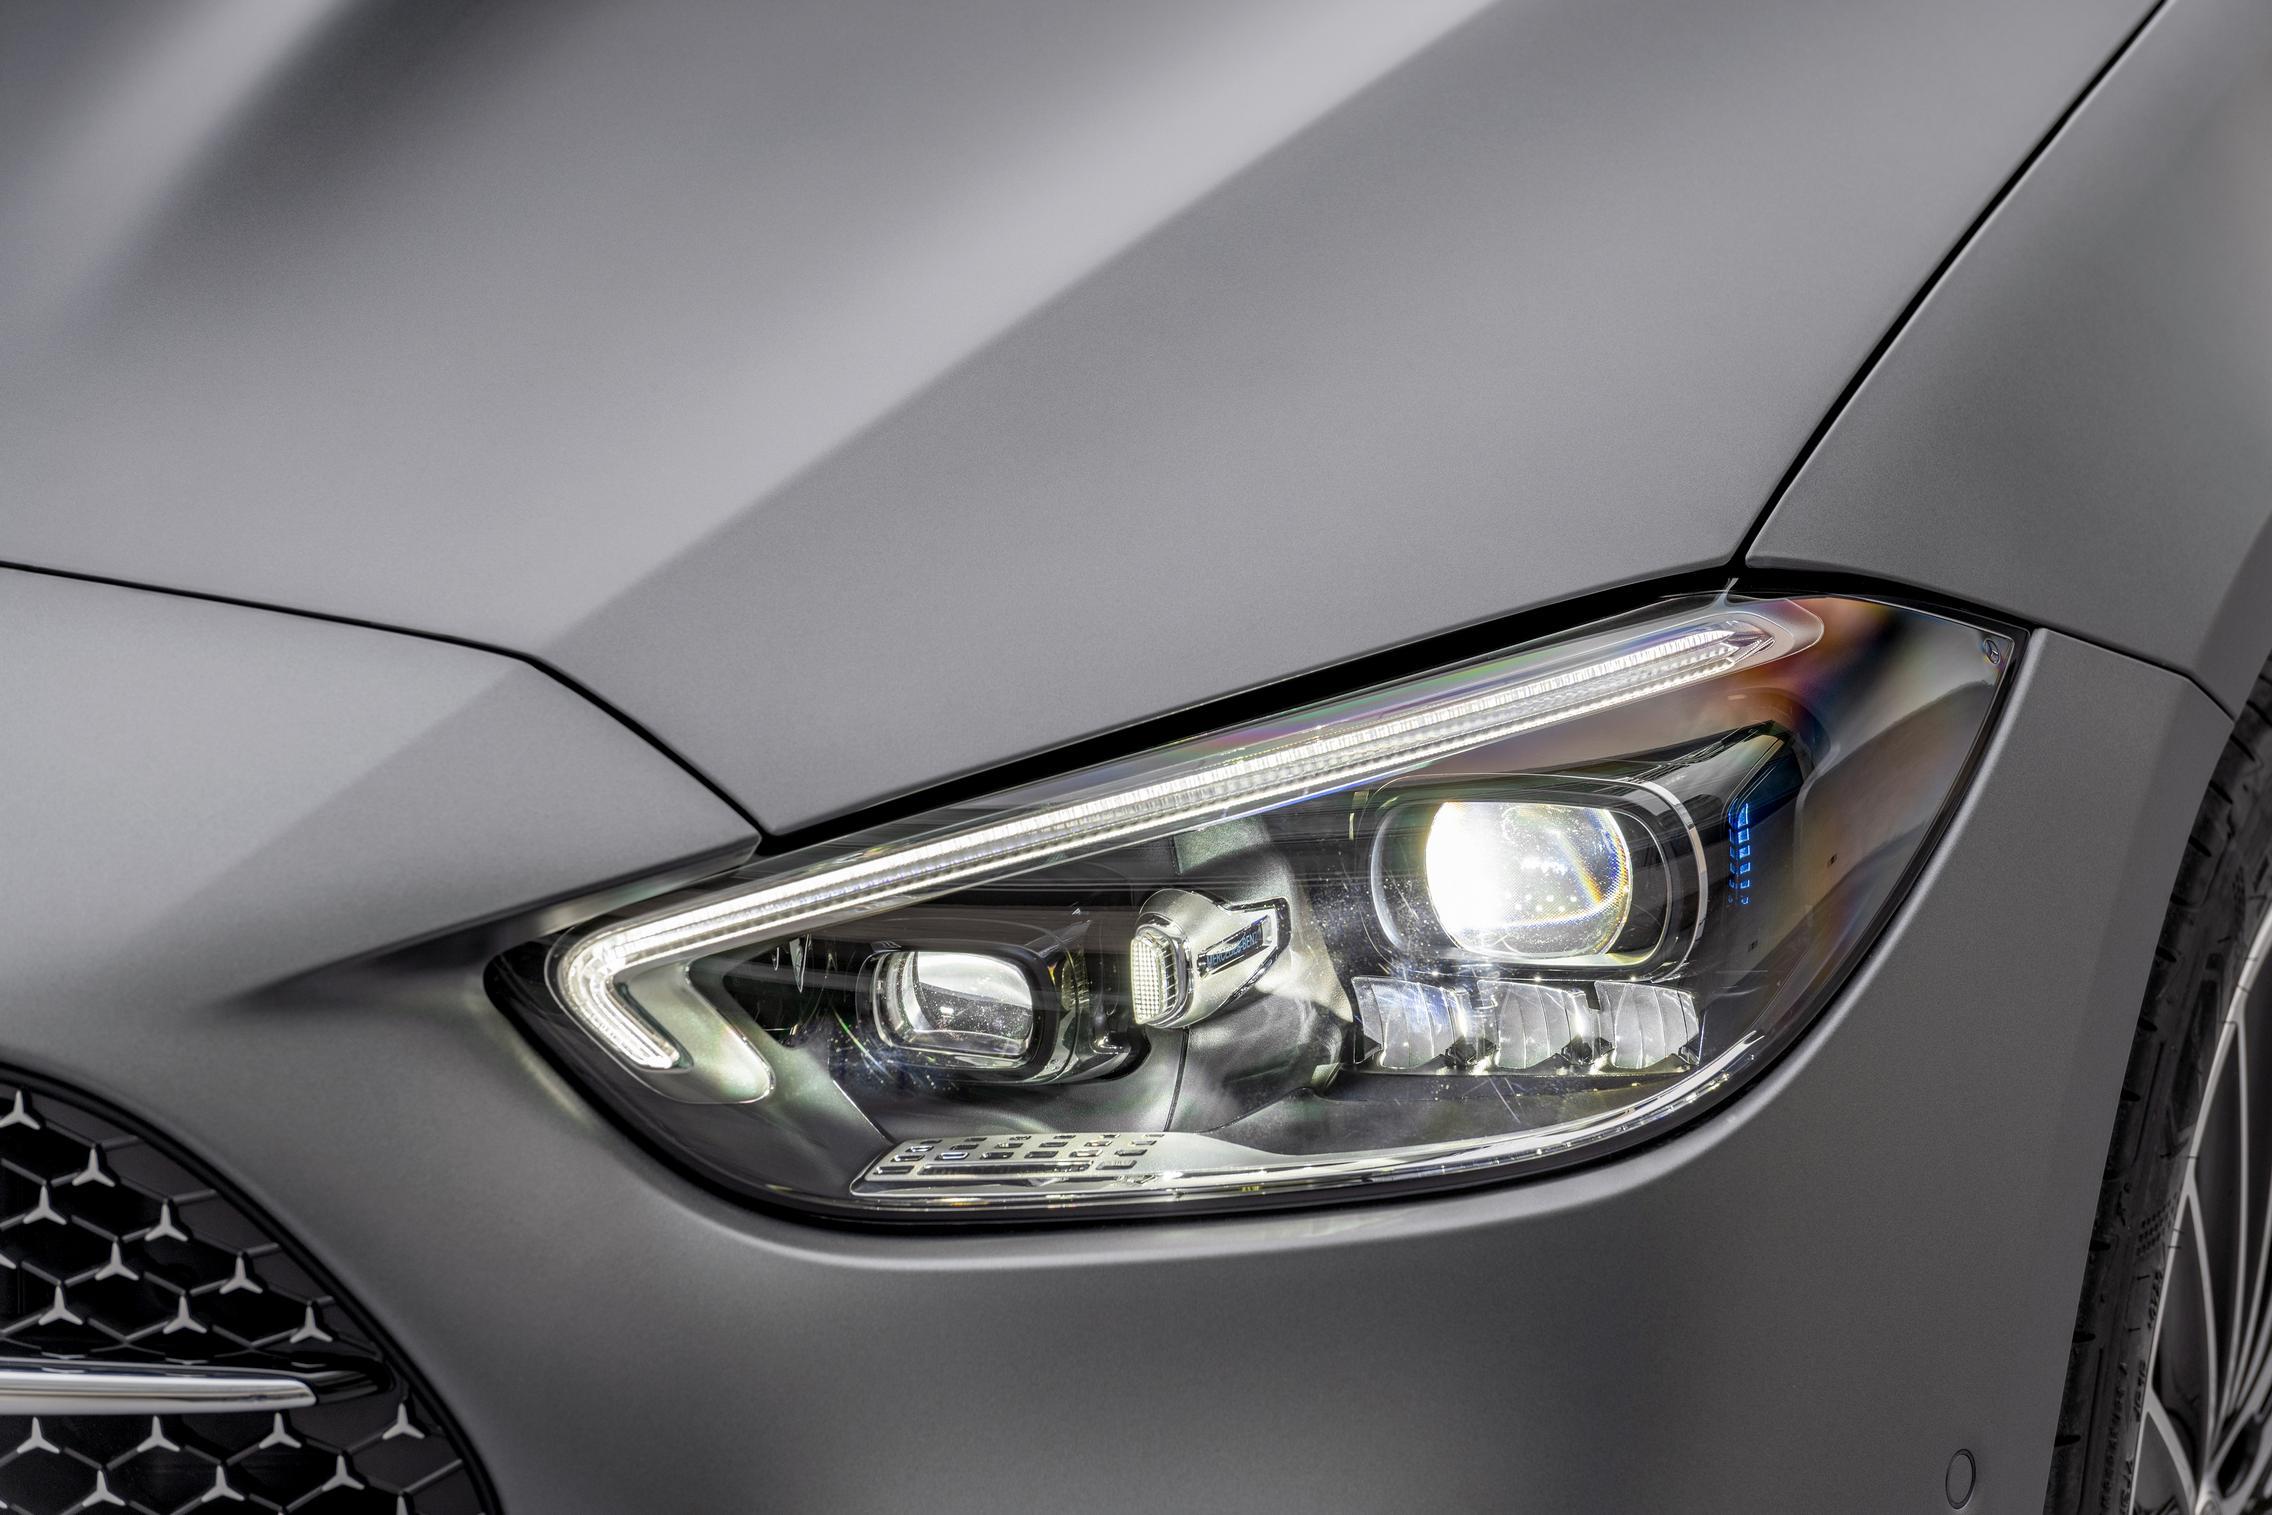 New-W206-C-Class-headlight